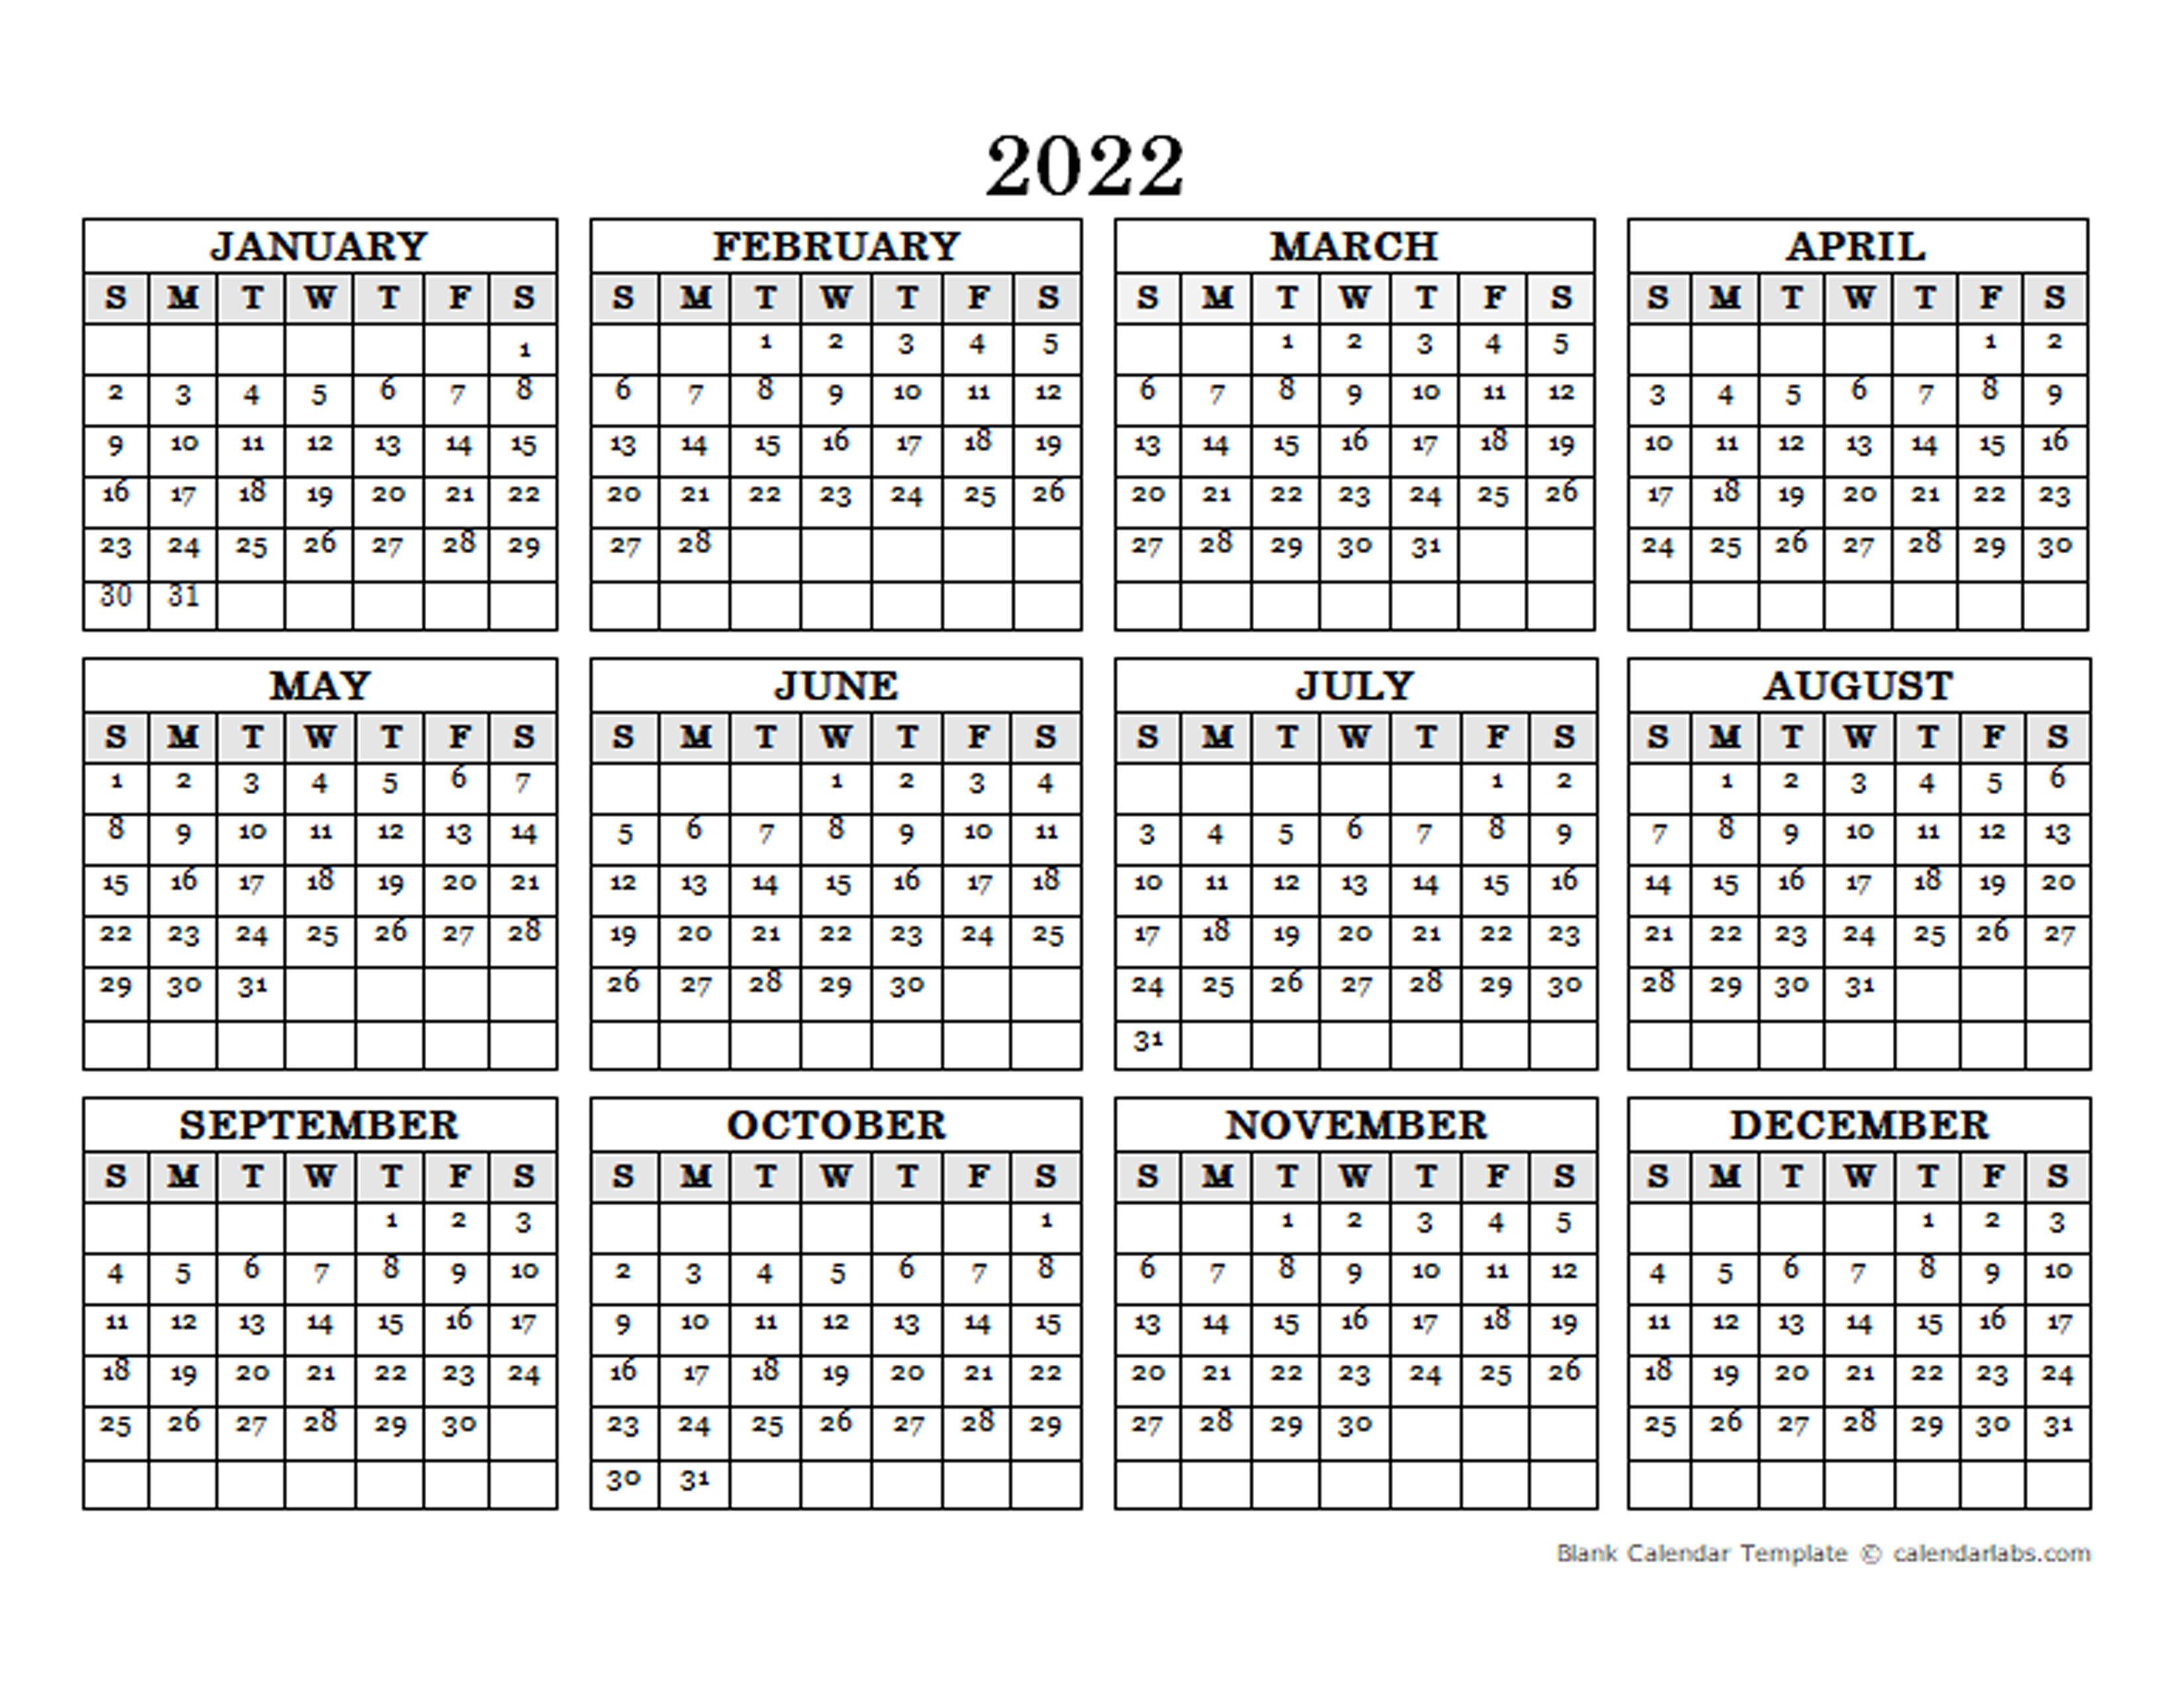 2022 Blank Yearly Calendar Landscape - Free Printable ...